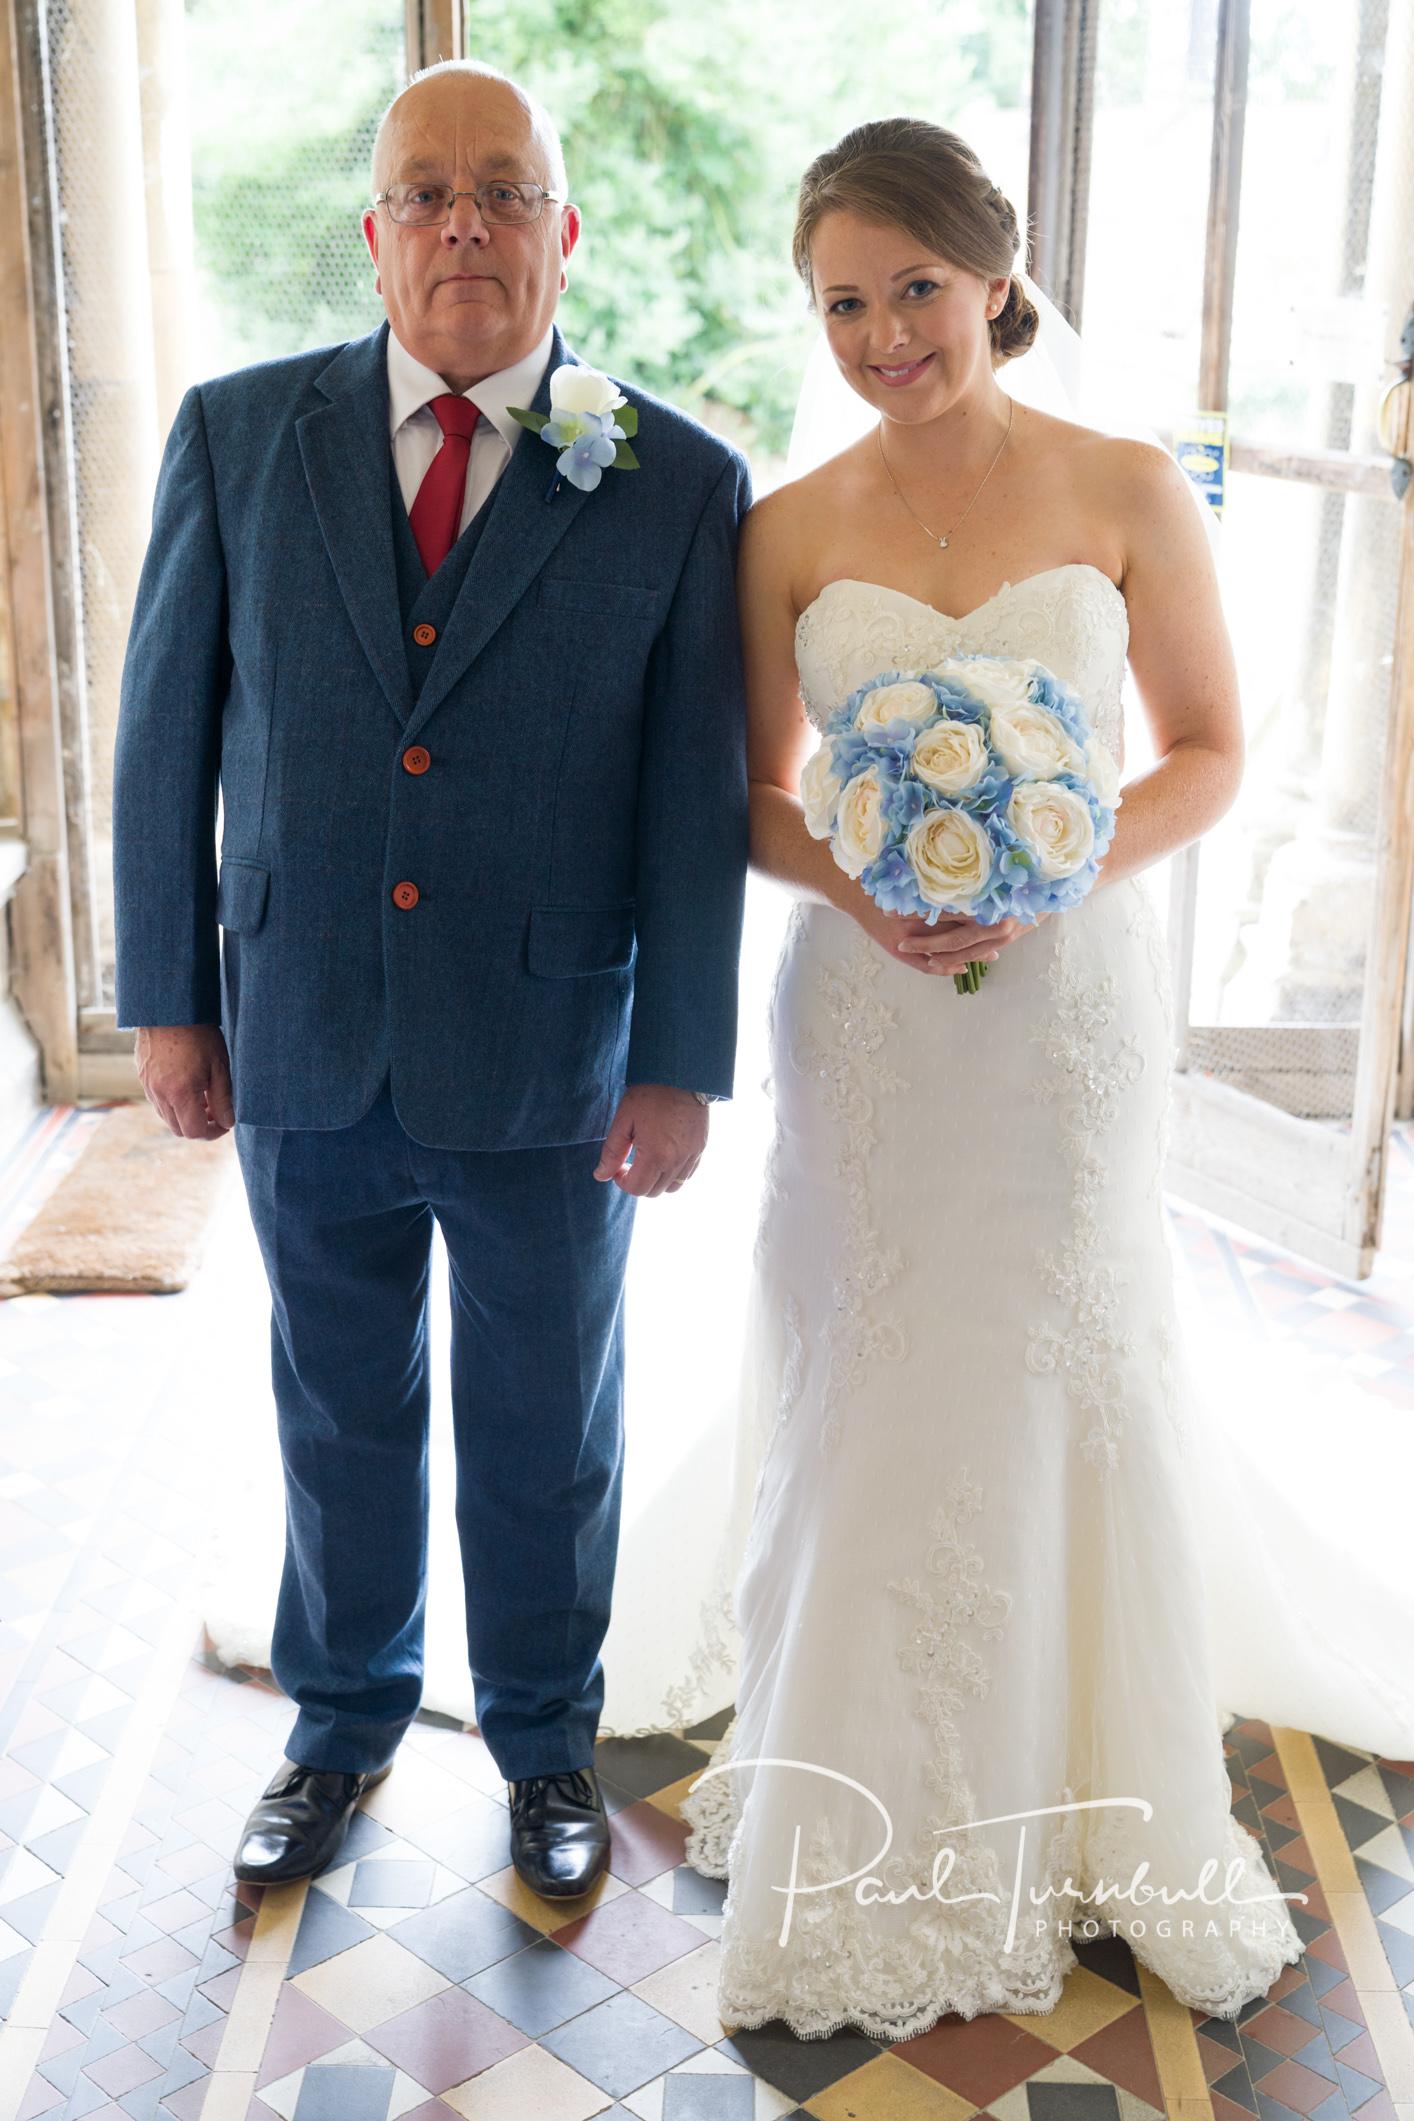 wedding-photographer-south-dalton-walkington-yorkshire-emma-james-031.jpg